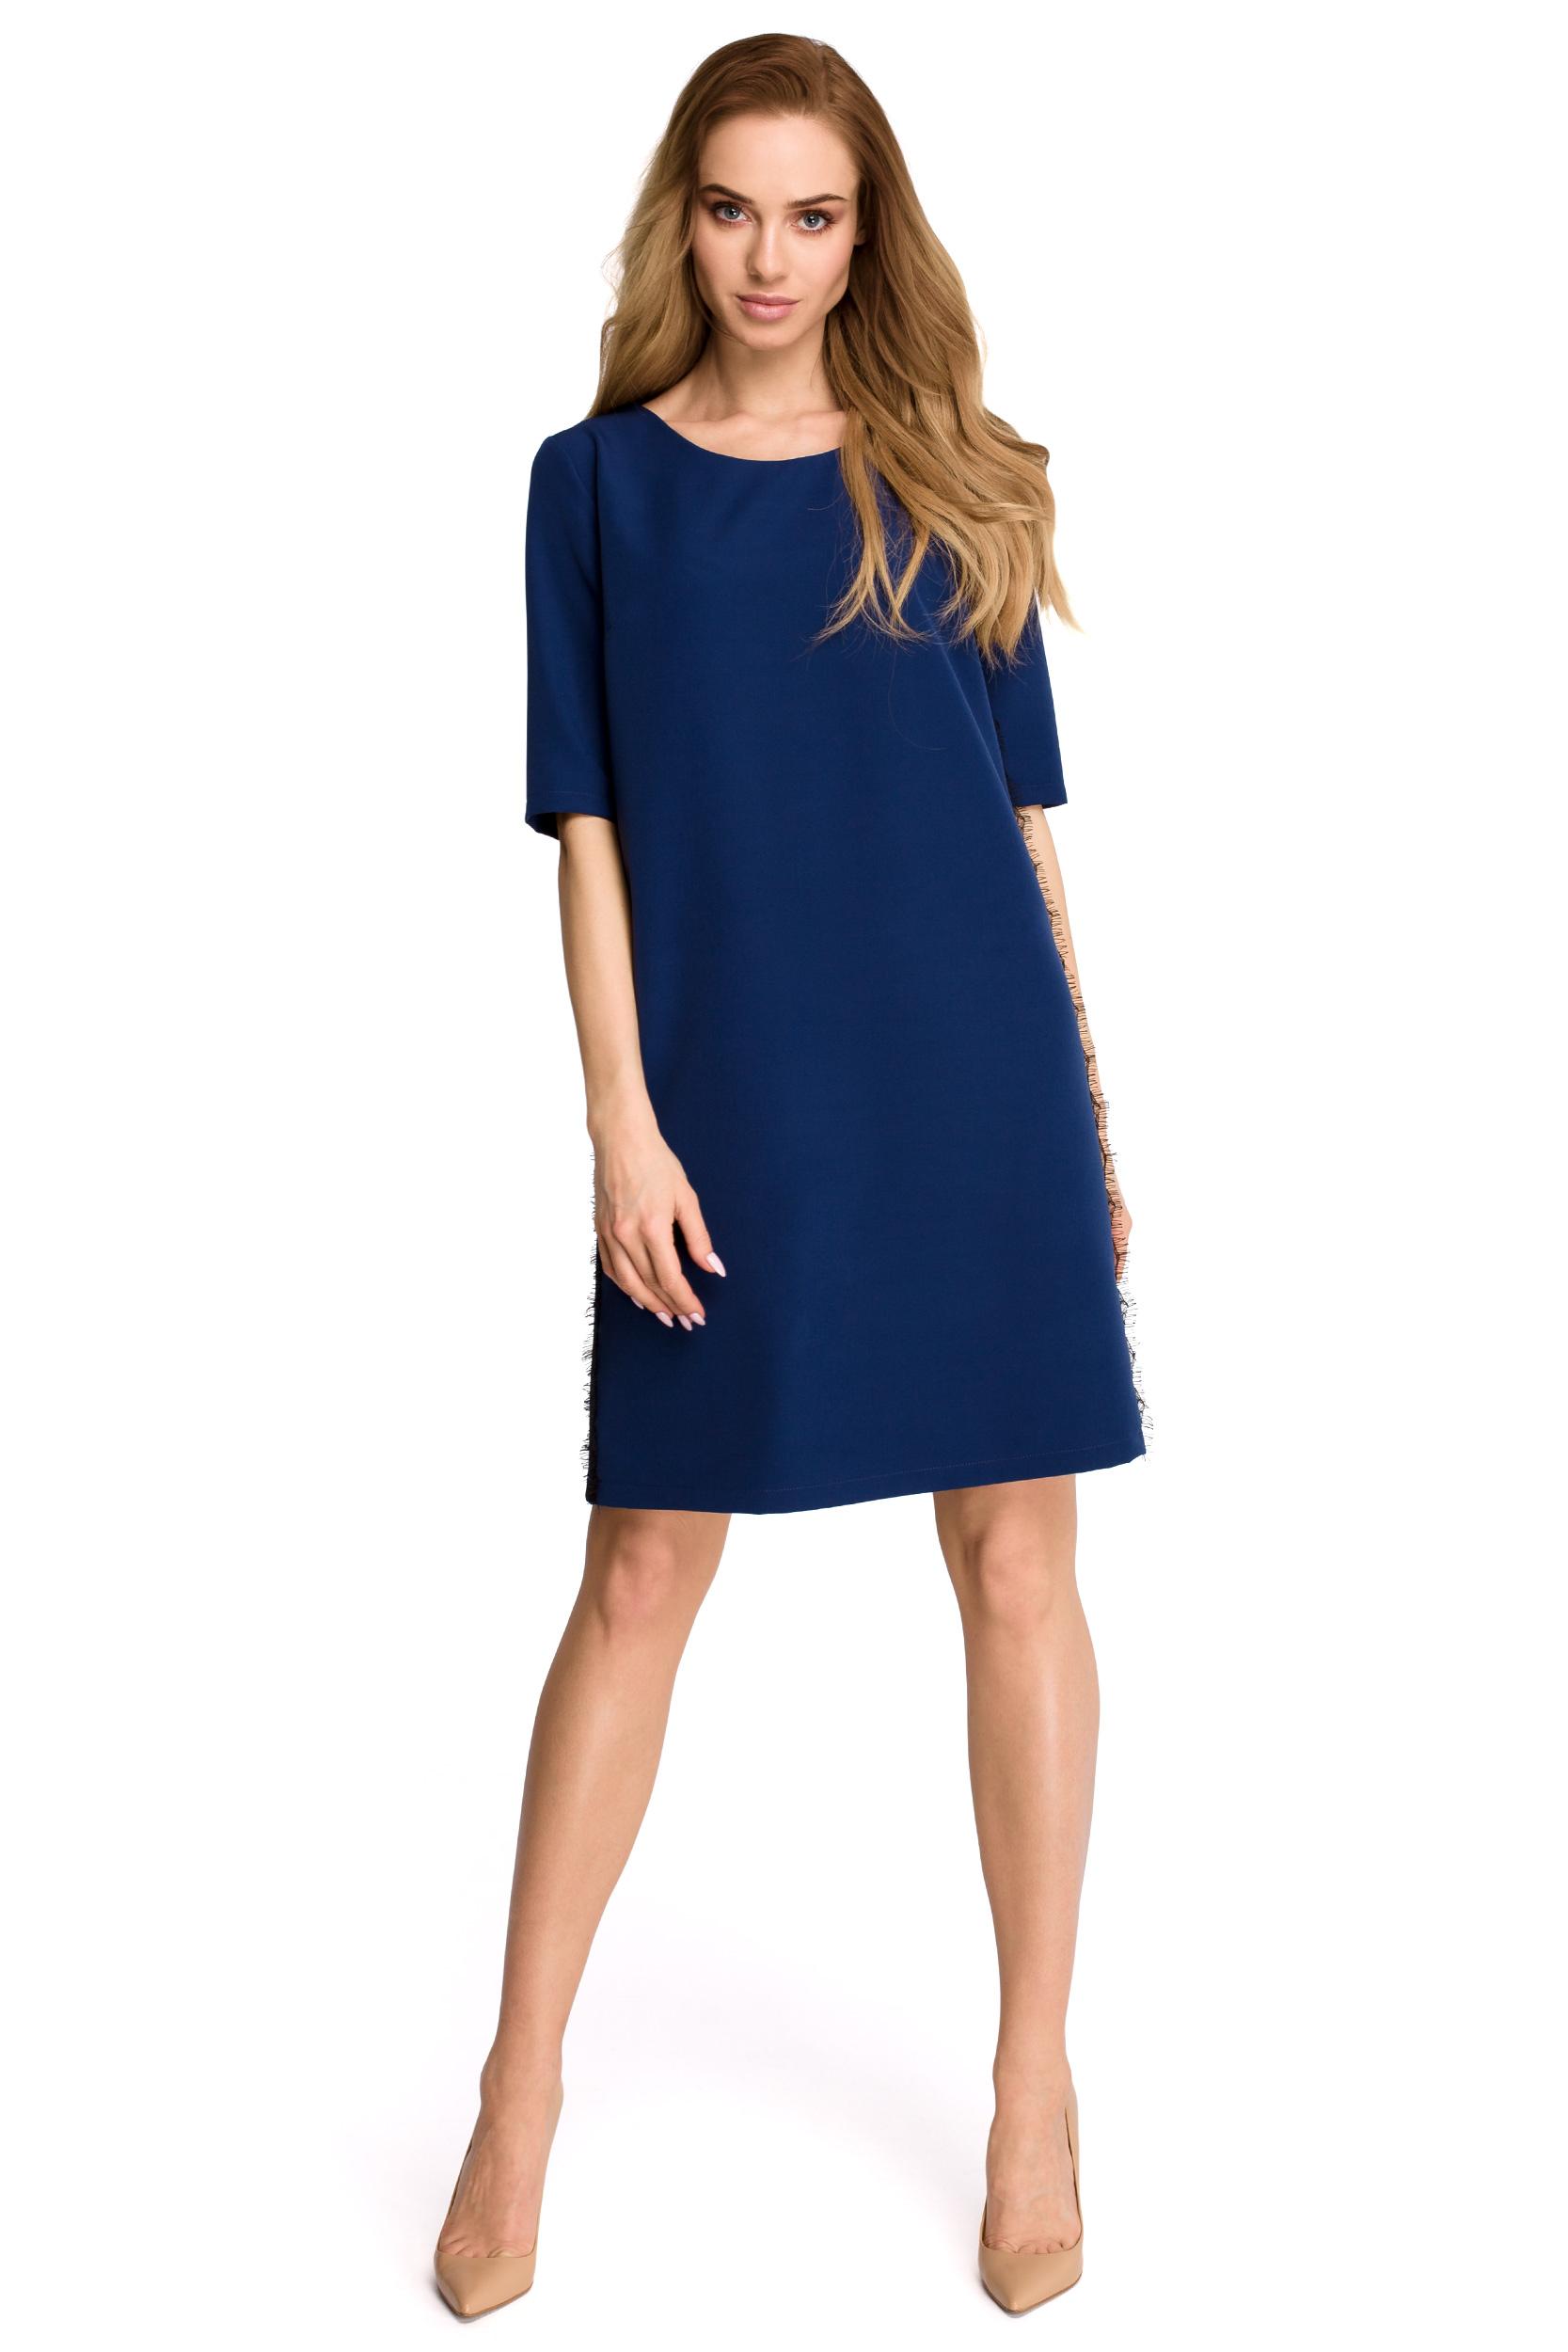 b335f2ad8c Elegancka prosta niedopasowana sukienka luźna - 7709978602 ...